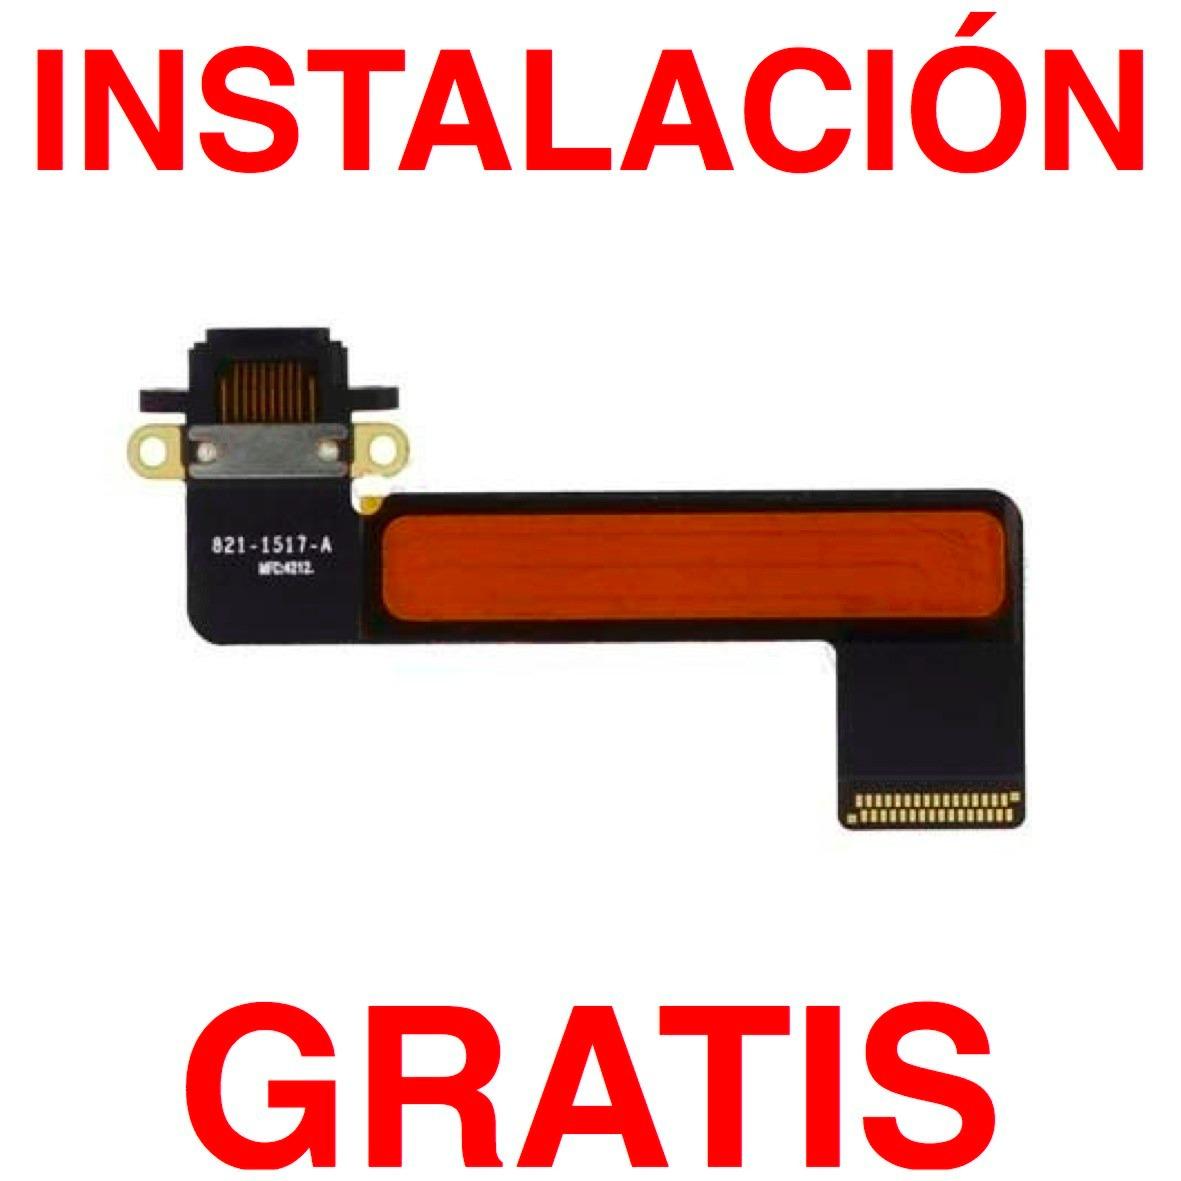 Centro De Carga Ipad Mini Instalacion Gratis - Flex Original ...